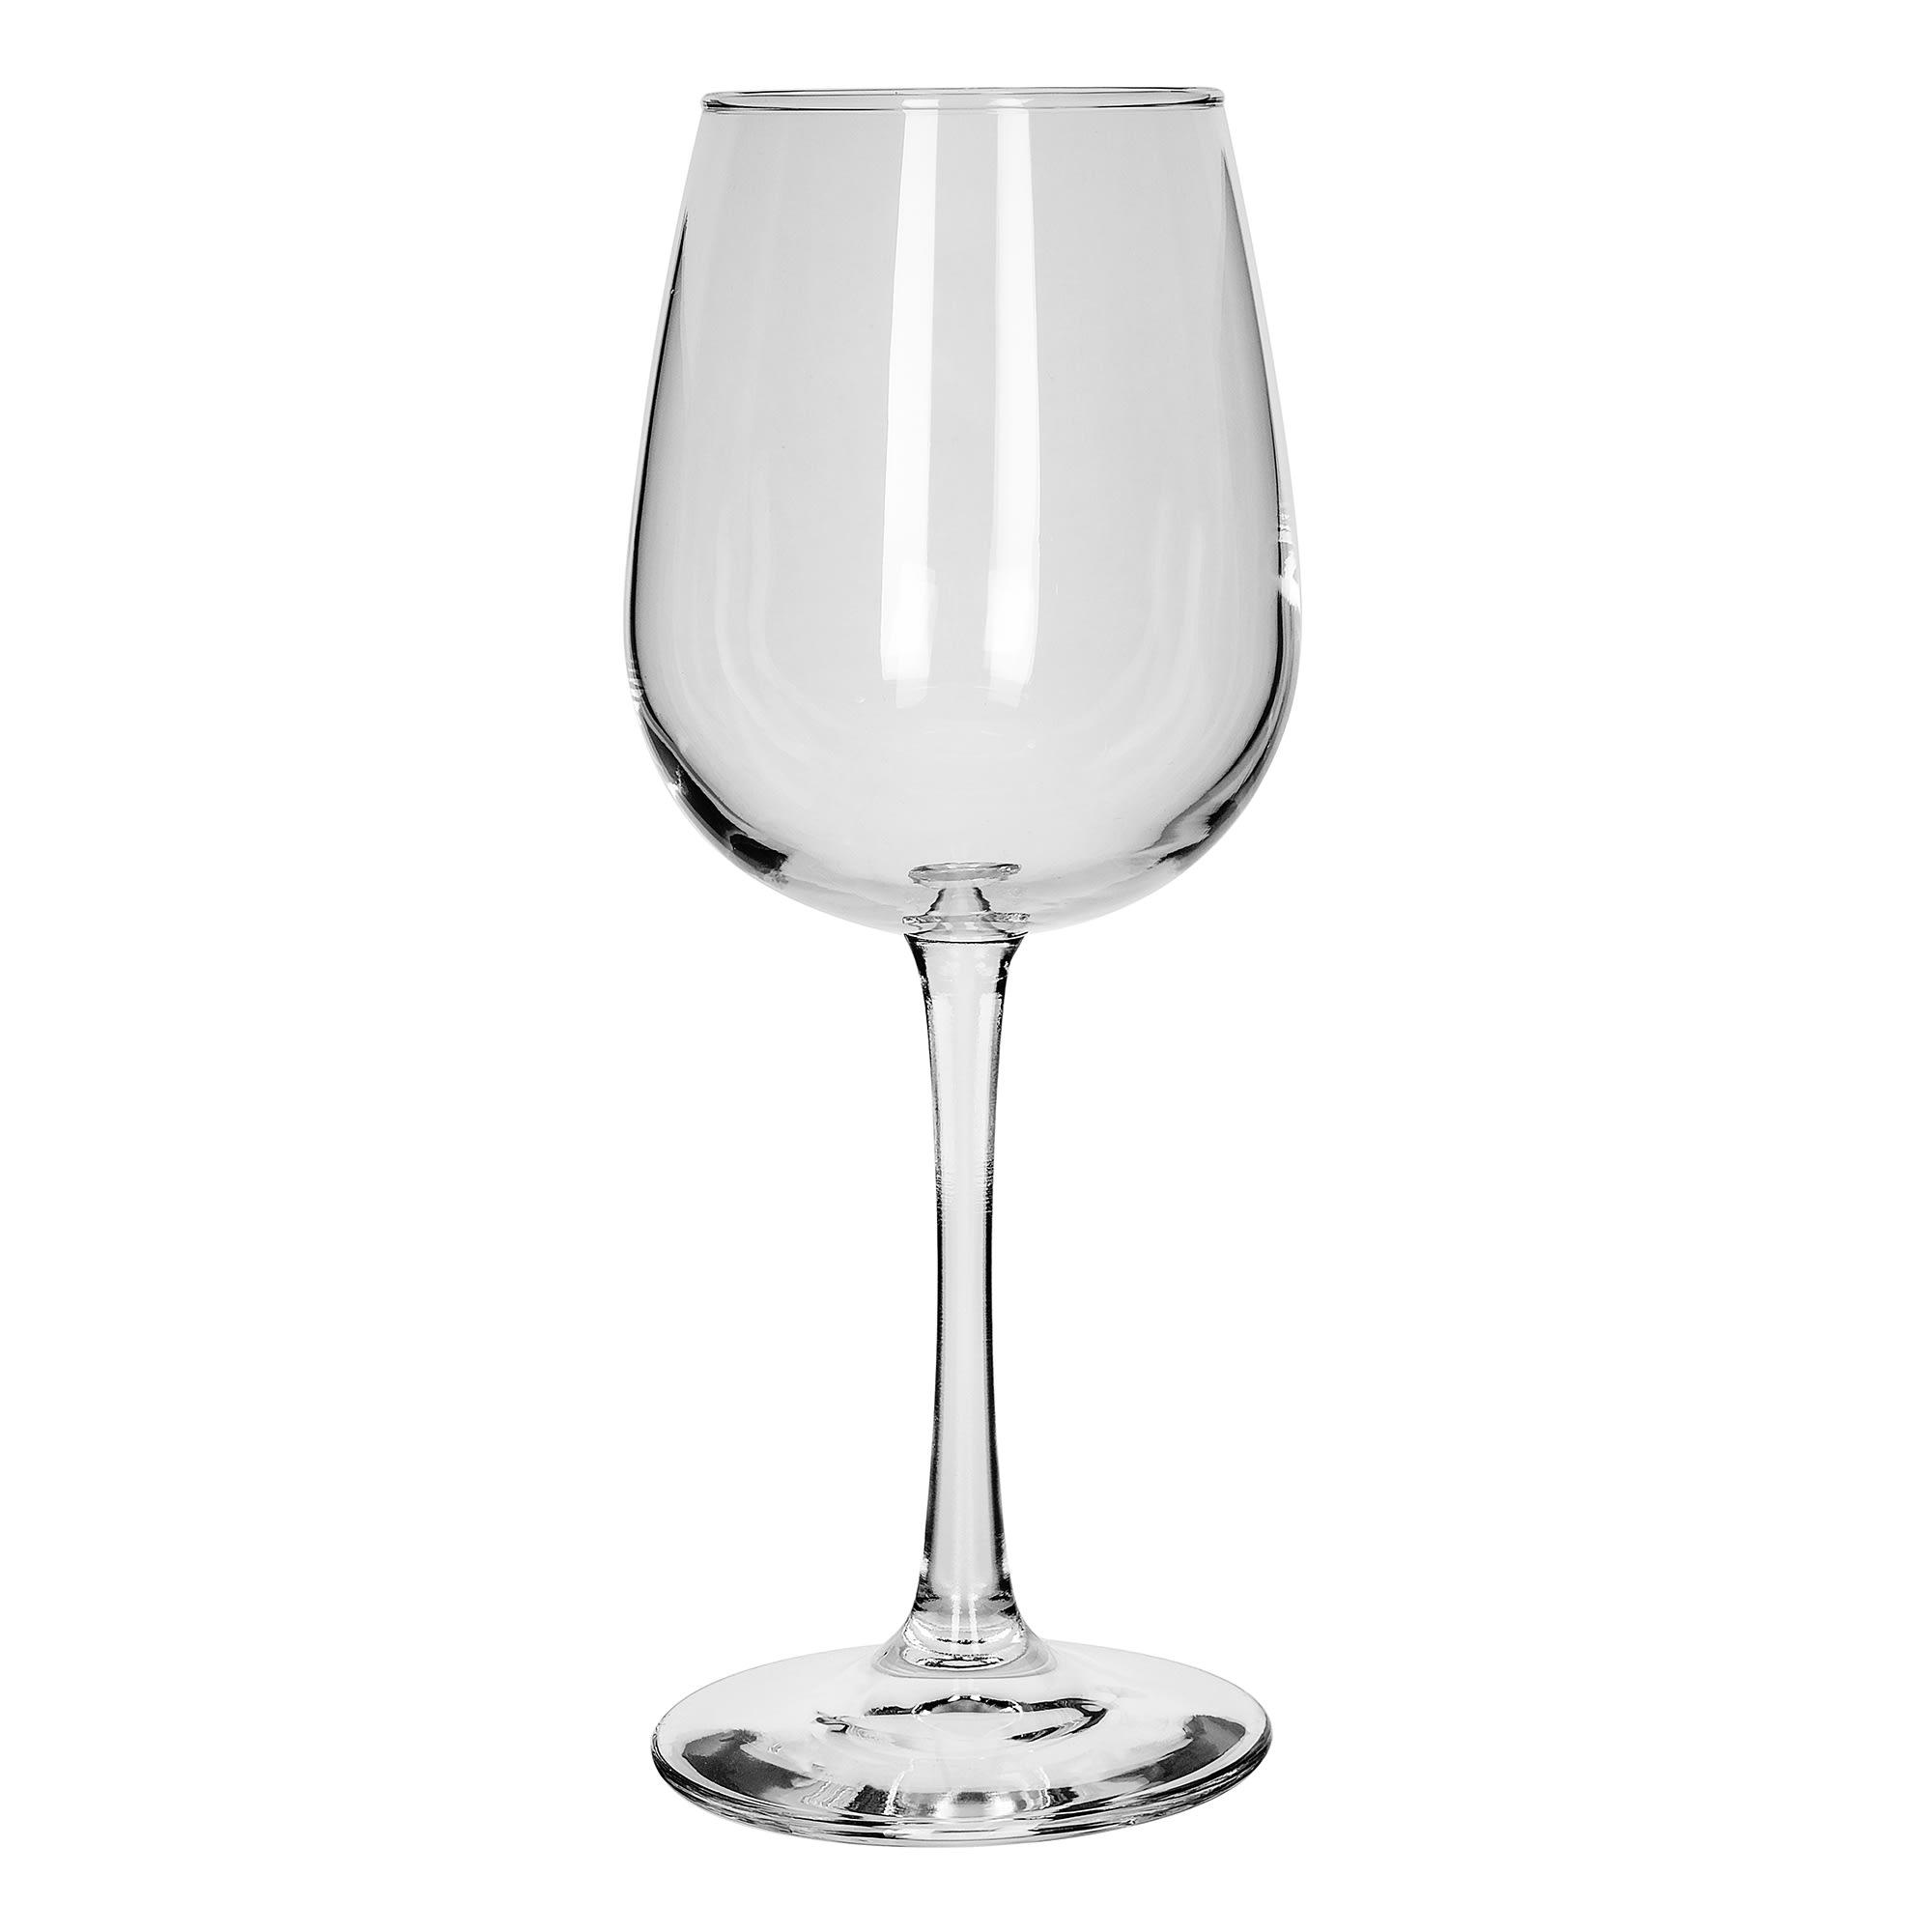 Libbey 7508 12.75-oz Vina Wine Taster Glass - Safedge Rim & Foot Guarantee